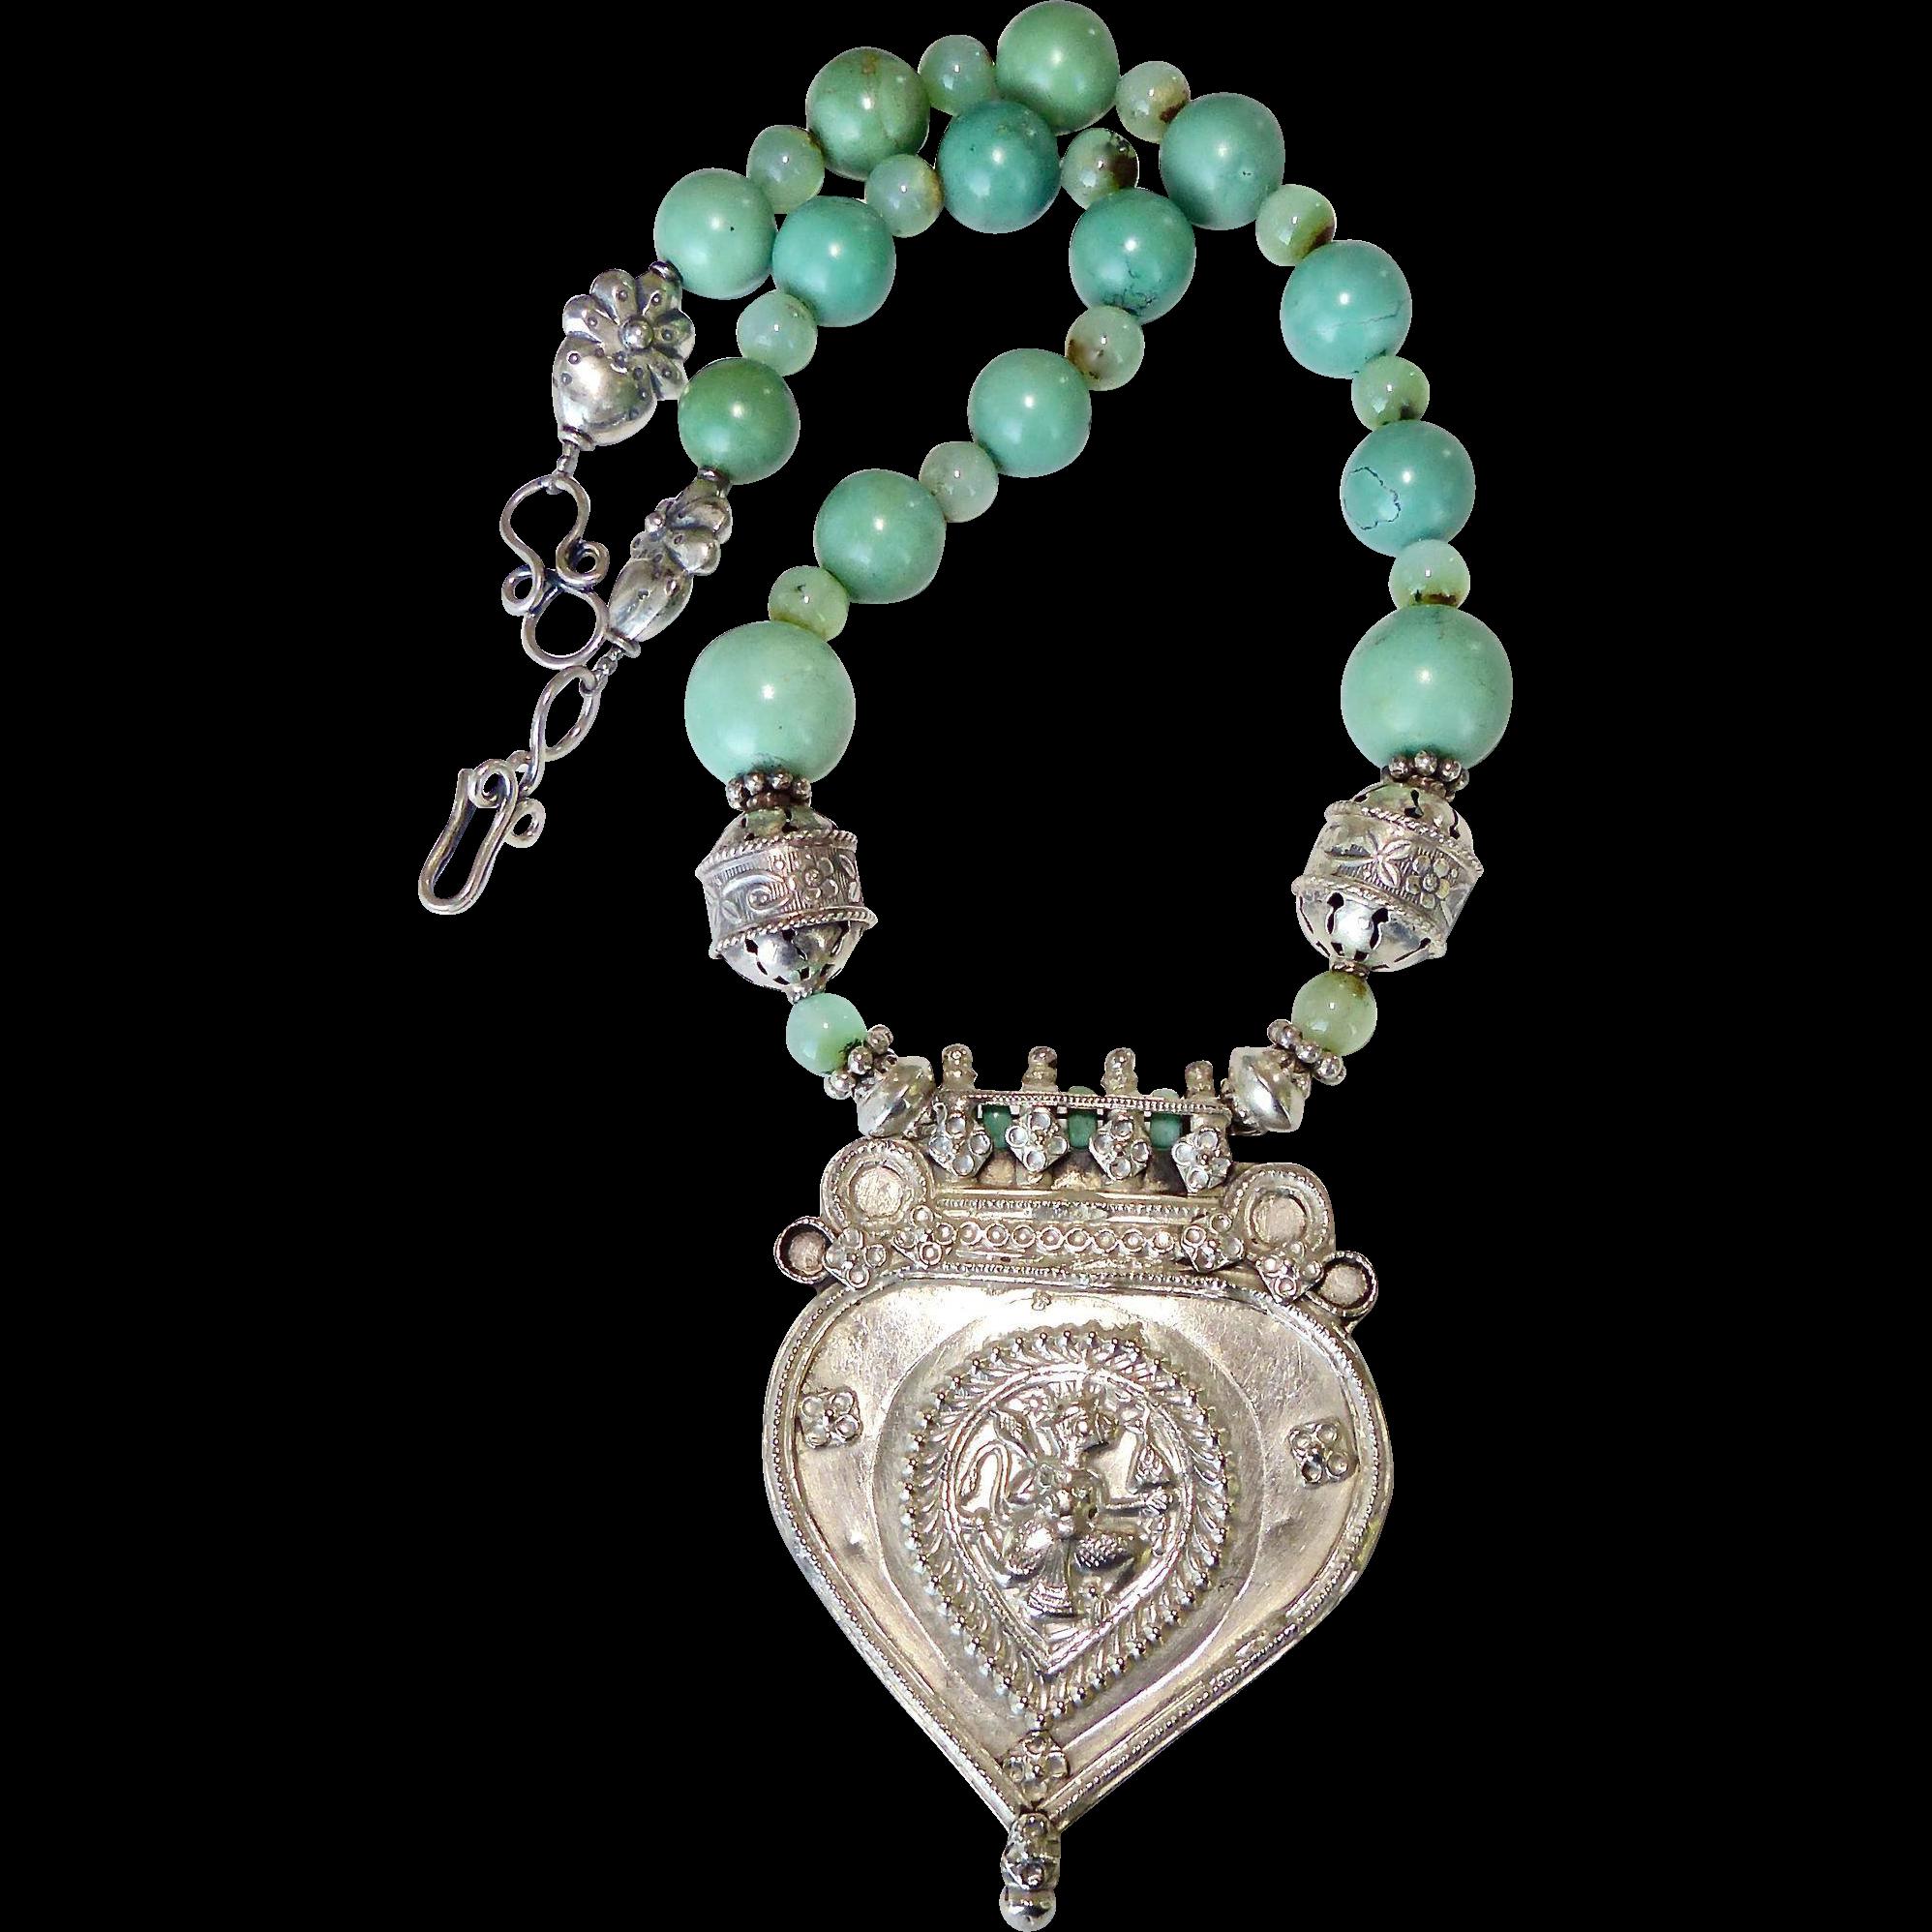 Antique indian silver hanuman pendant turquoise necklace carol antique indian silver hanuman pendant turquoise necklace carol barrett jewelry ruby lane aloadofball Images